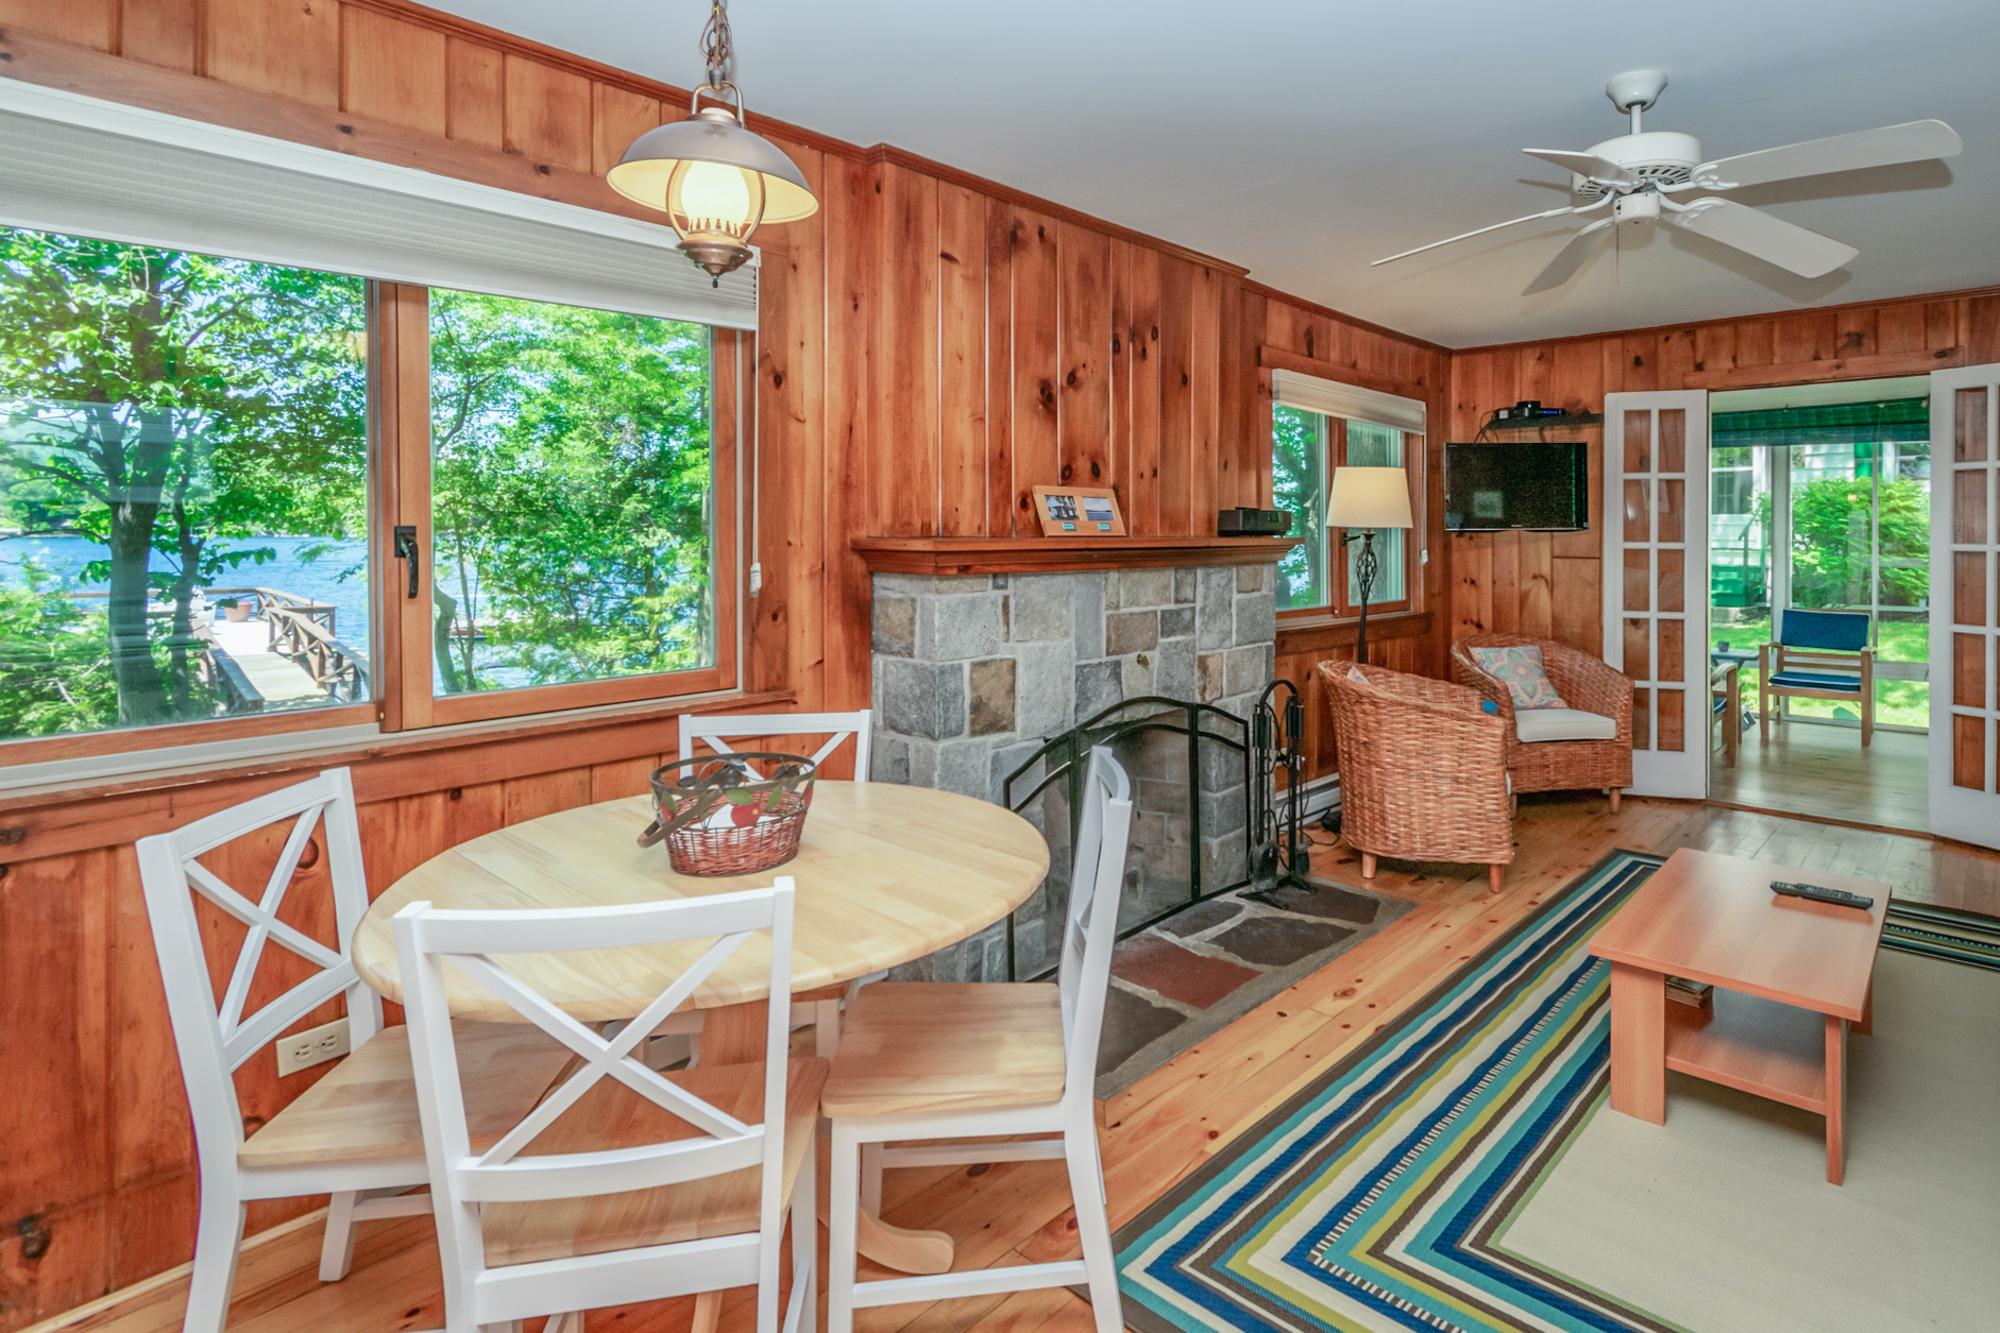 Takundewide Cottage #4 diningtable